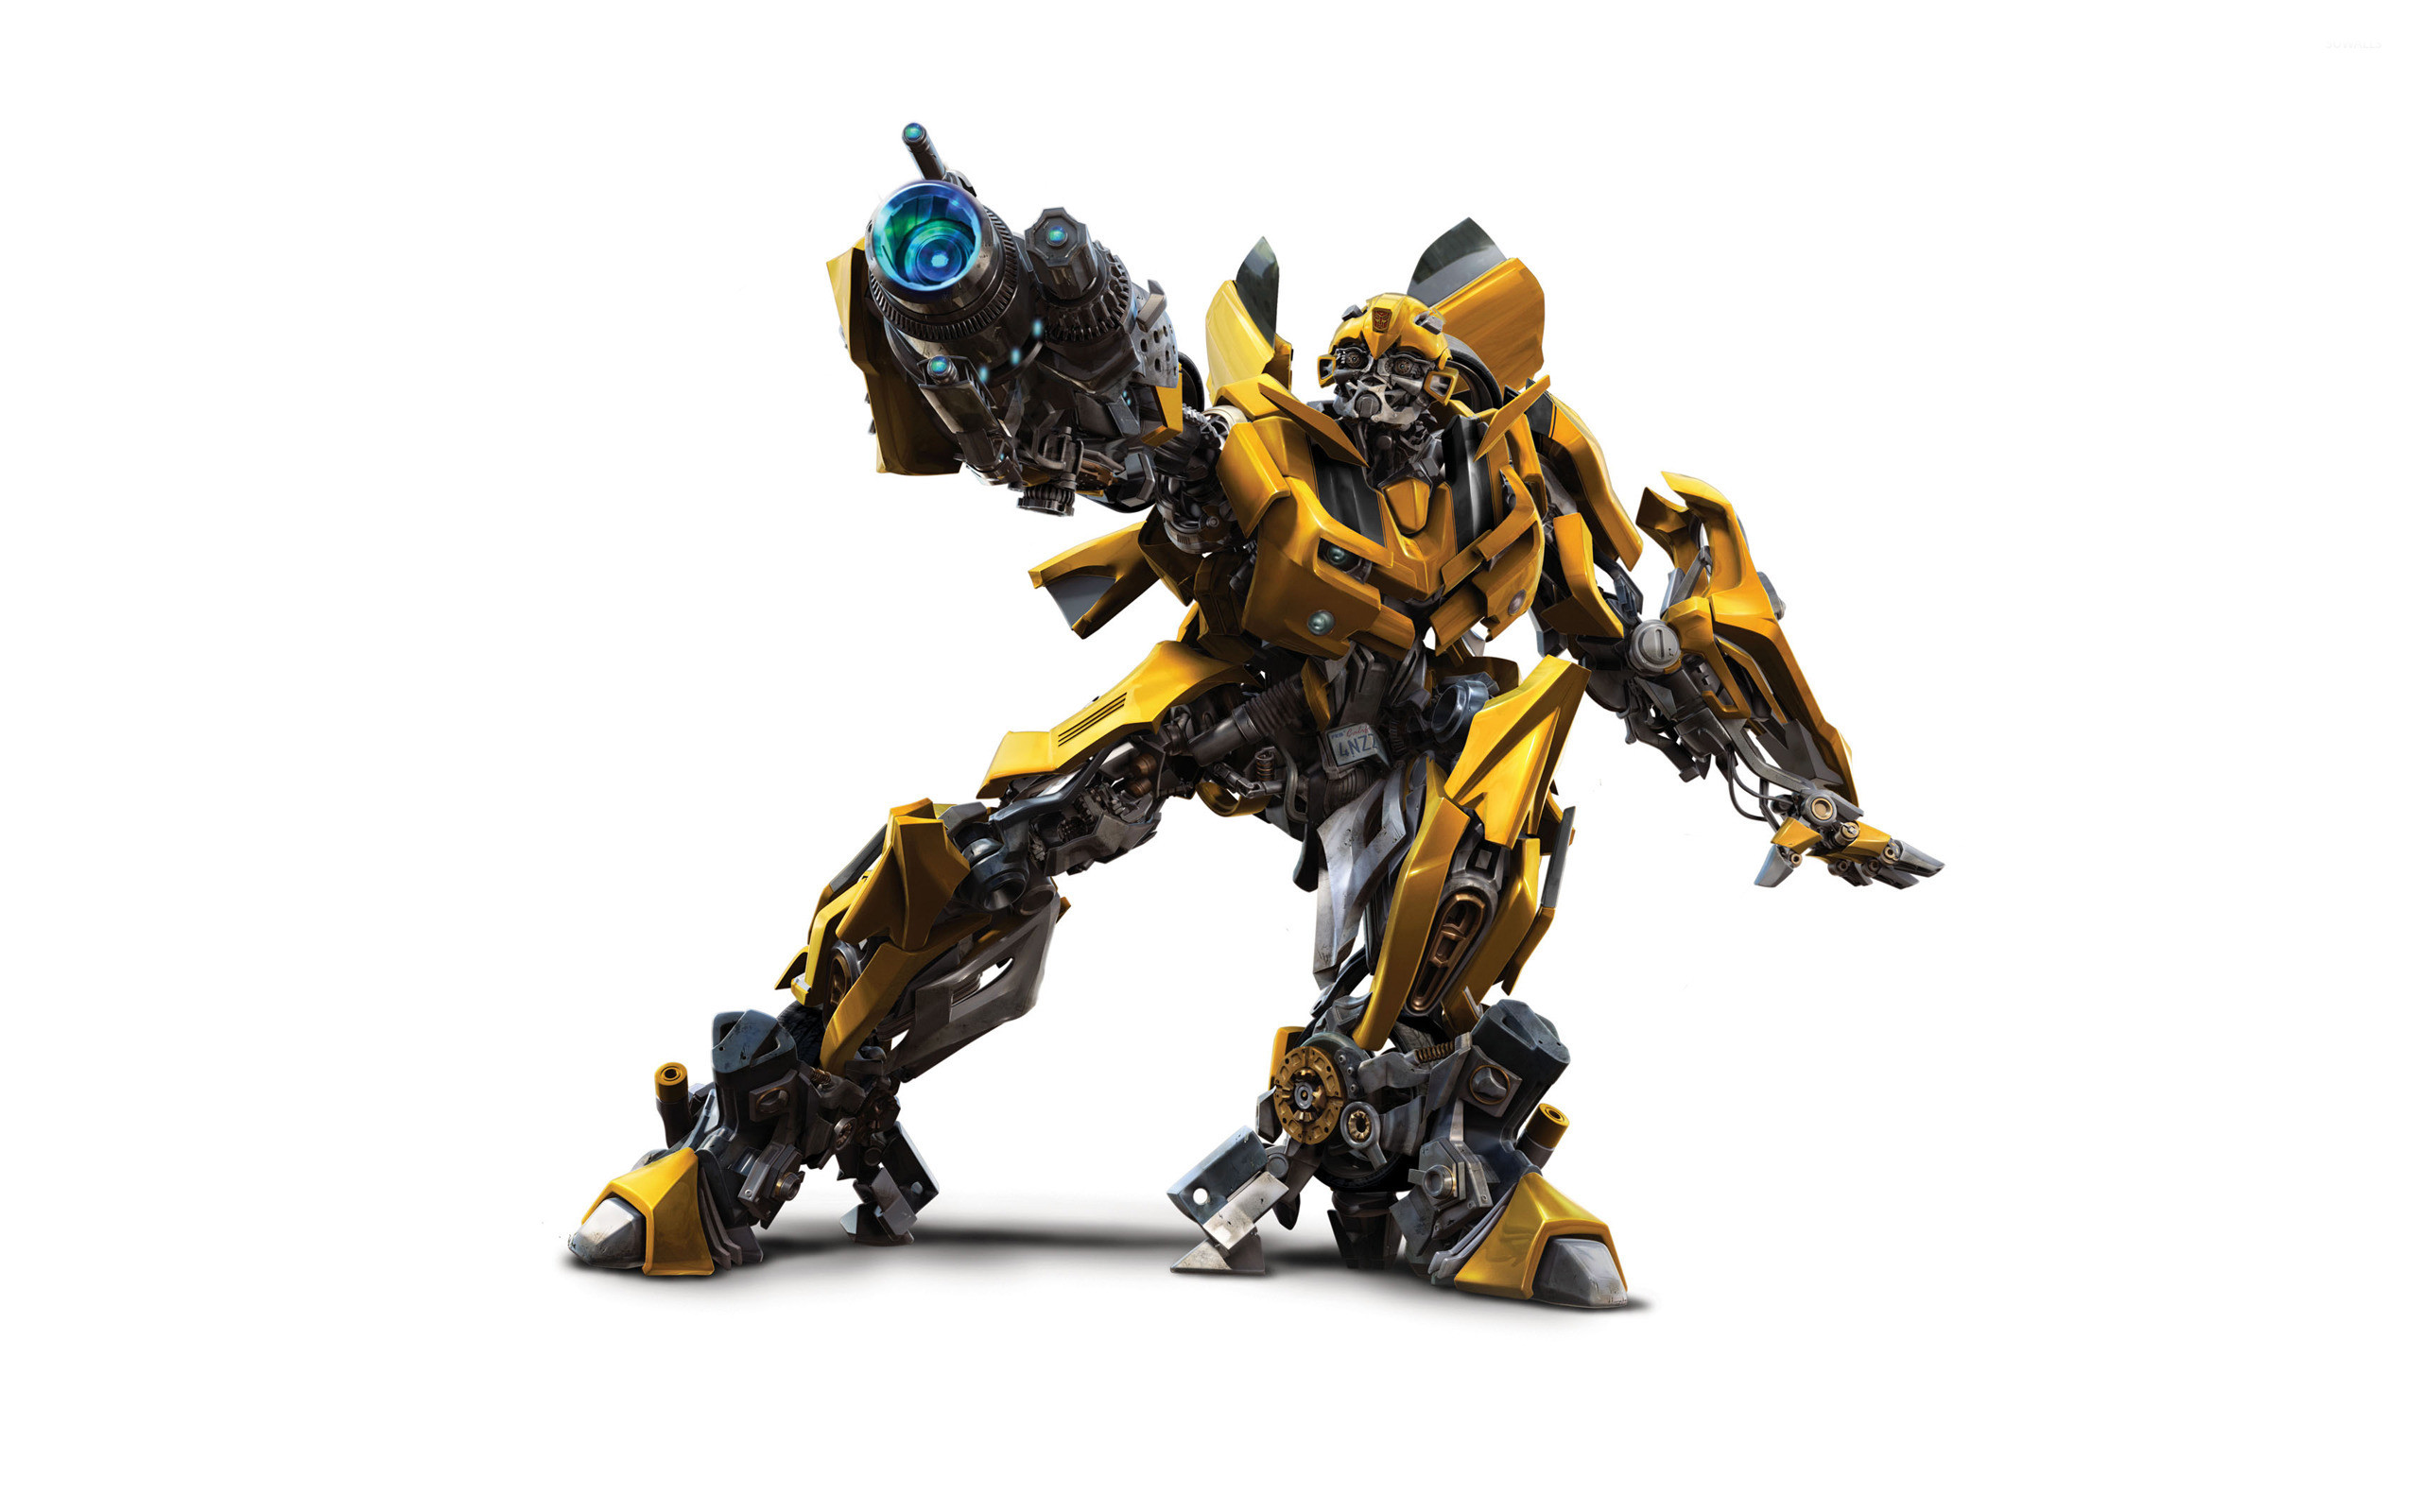 Res: 2560x1600, Bumblebee - Transformers wallpaper